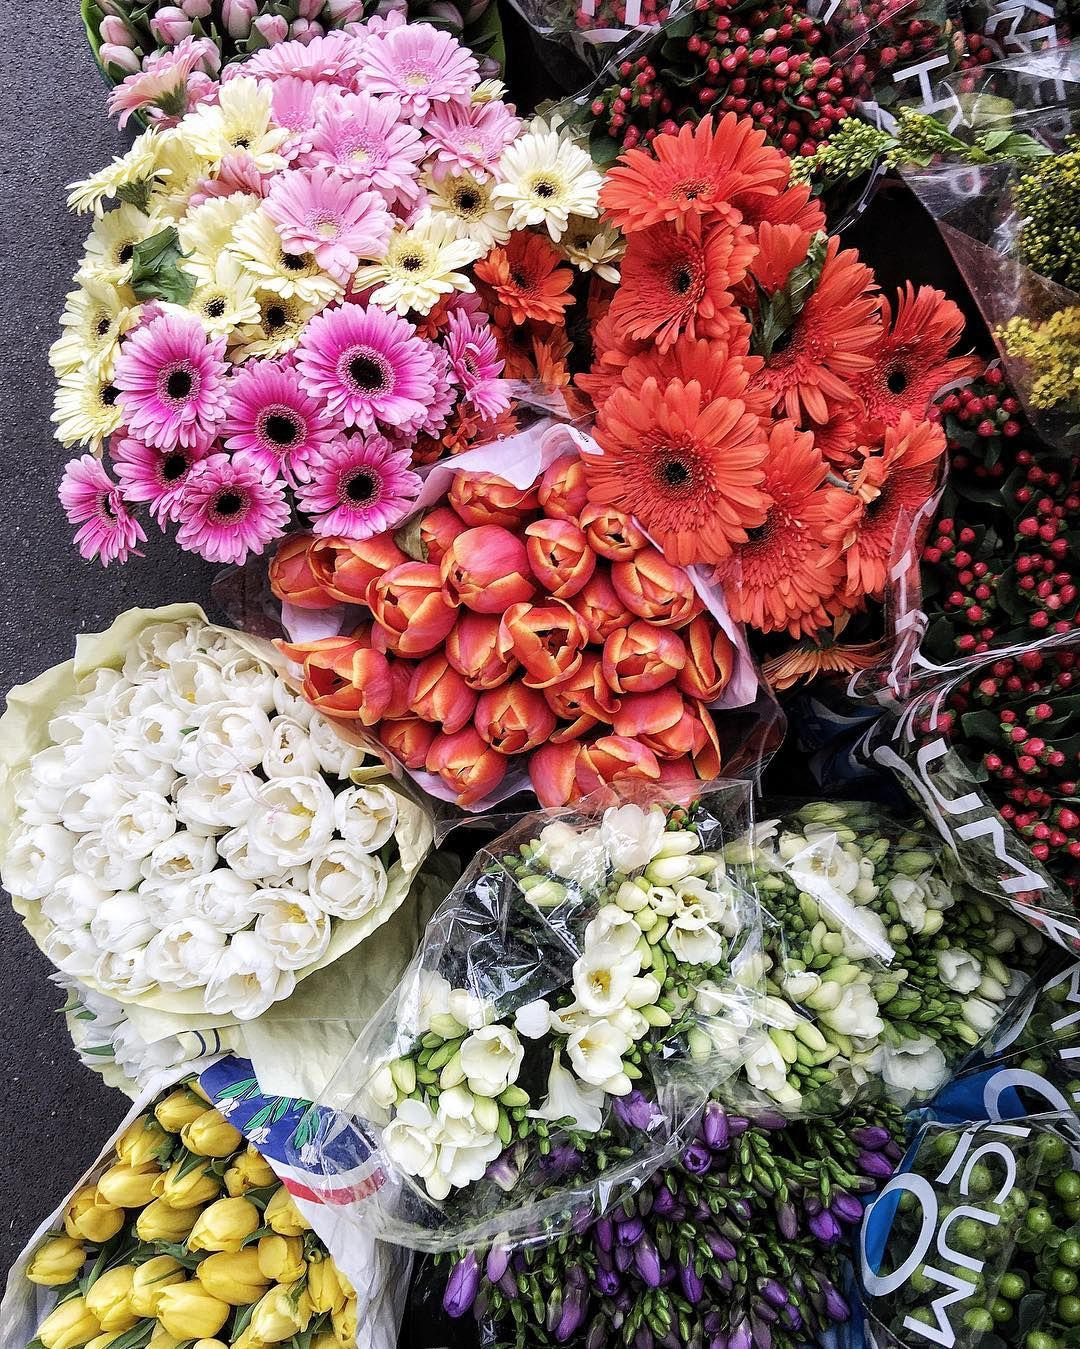 The sun to a rainy Sunday flowers happysunday by